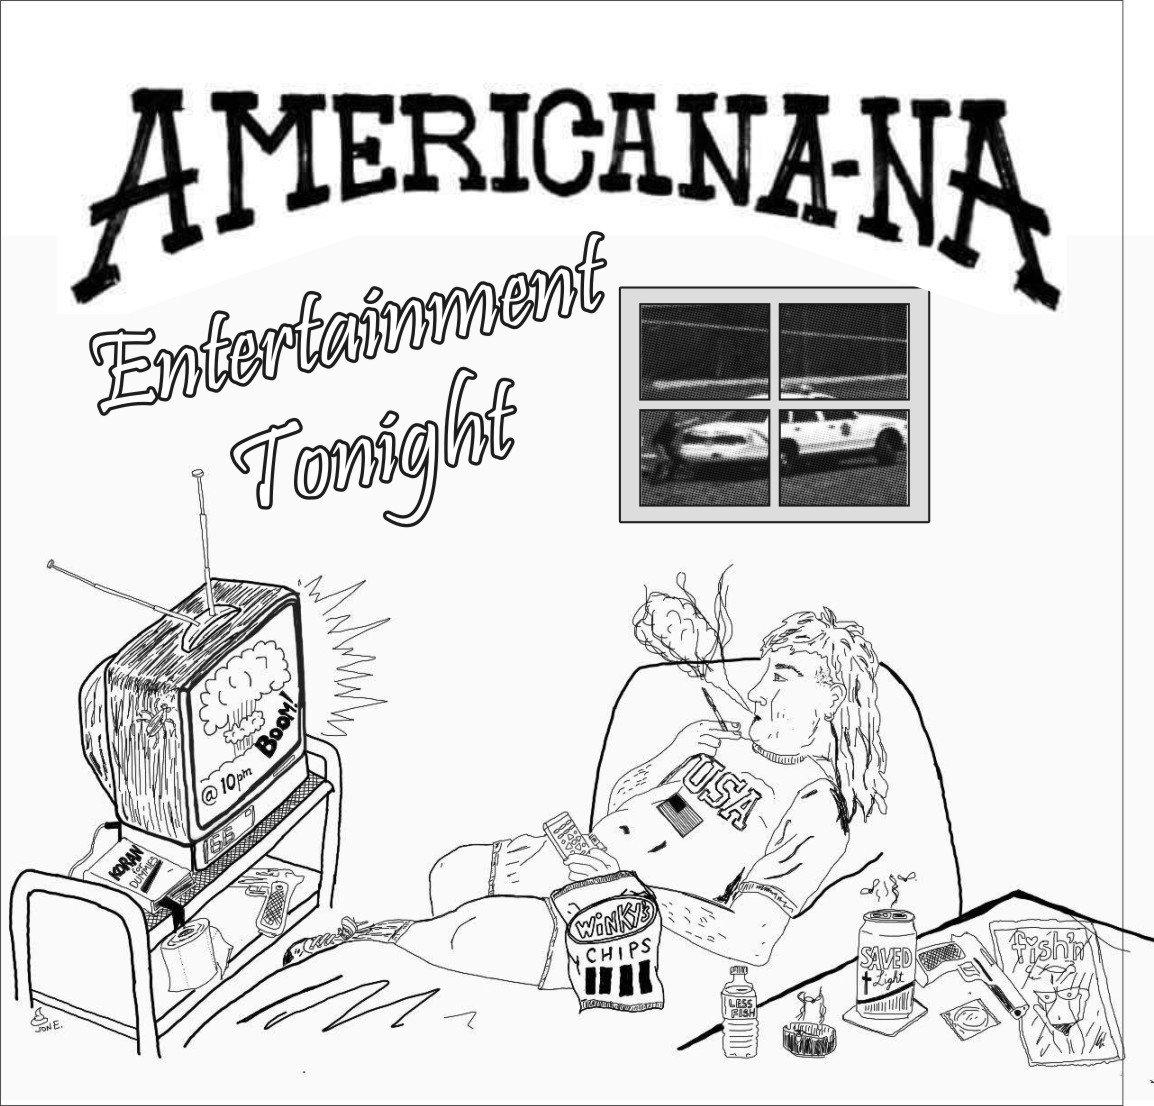 Americana-Na | ReverbNation